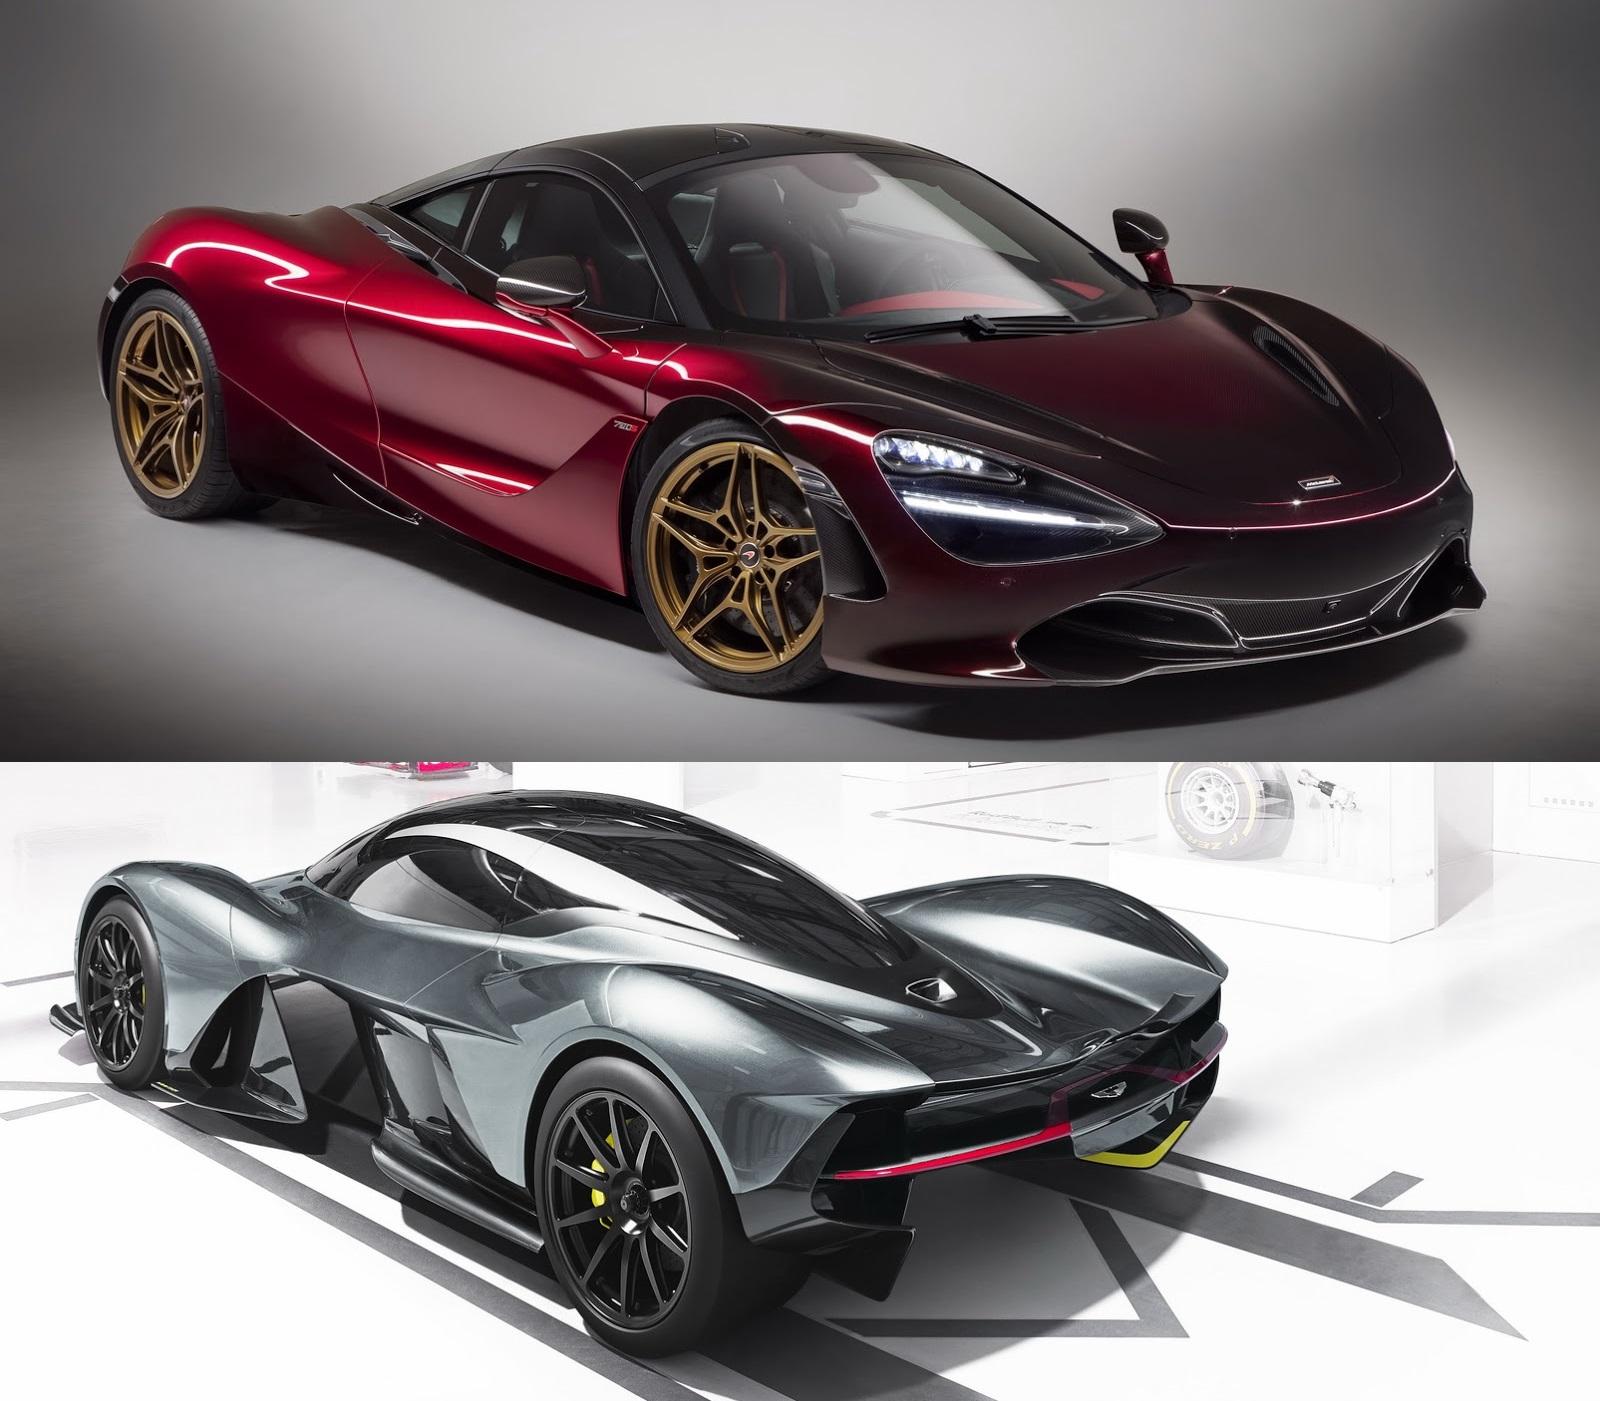 Aston Martin Valkyrie Should Generate A McLaren 720S Rival